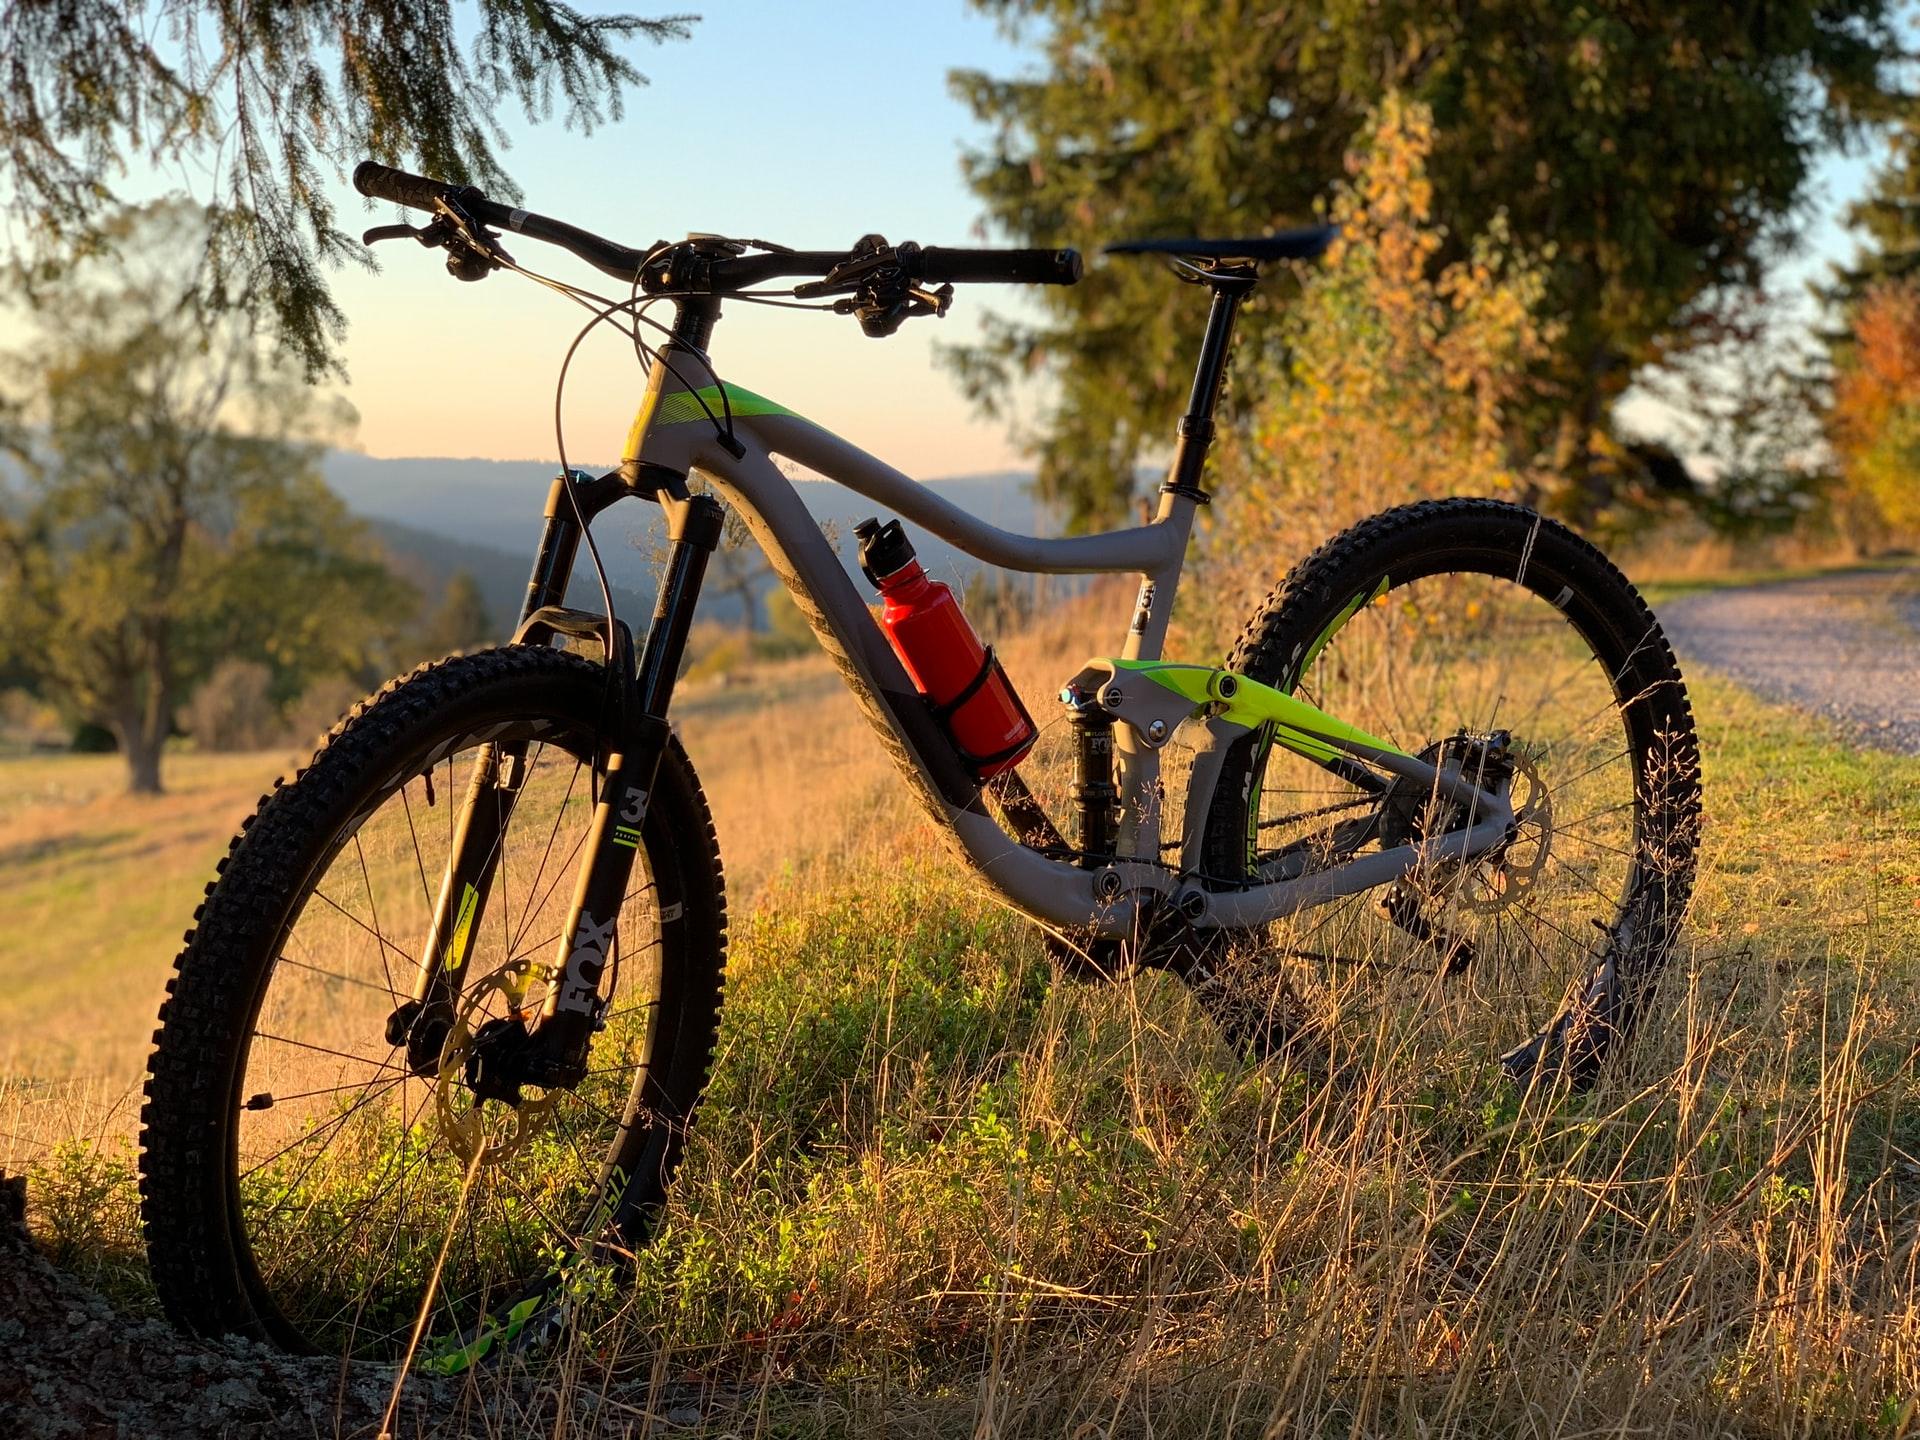 bikes rides in indianapolis